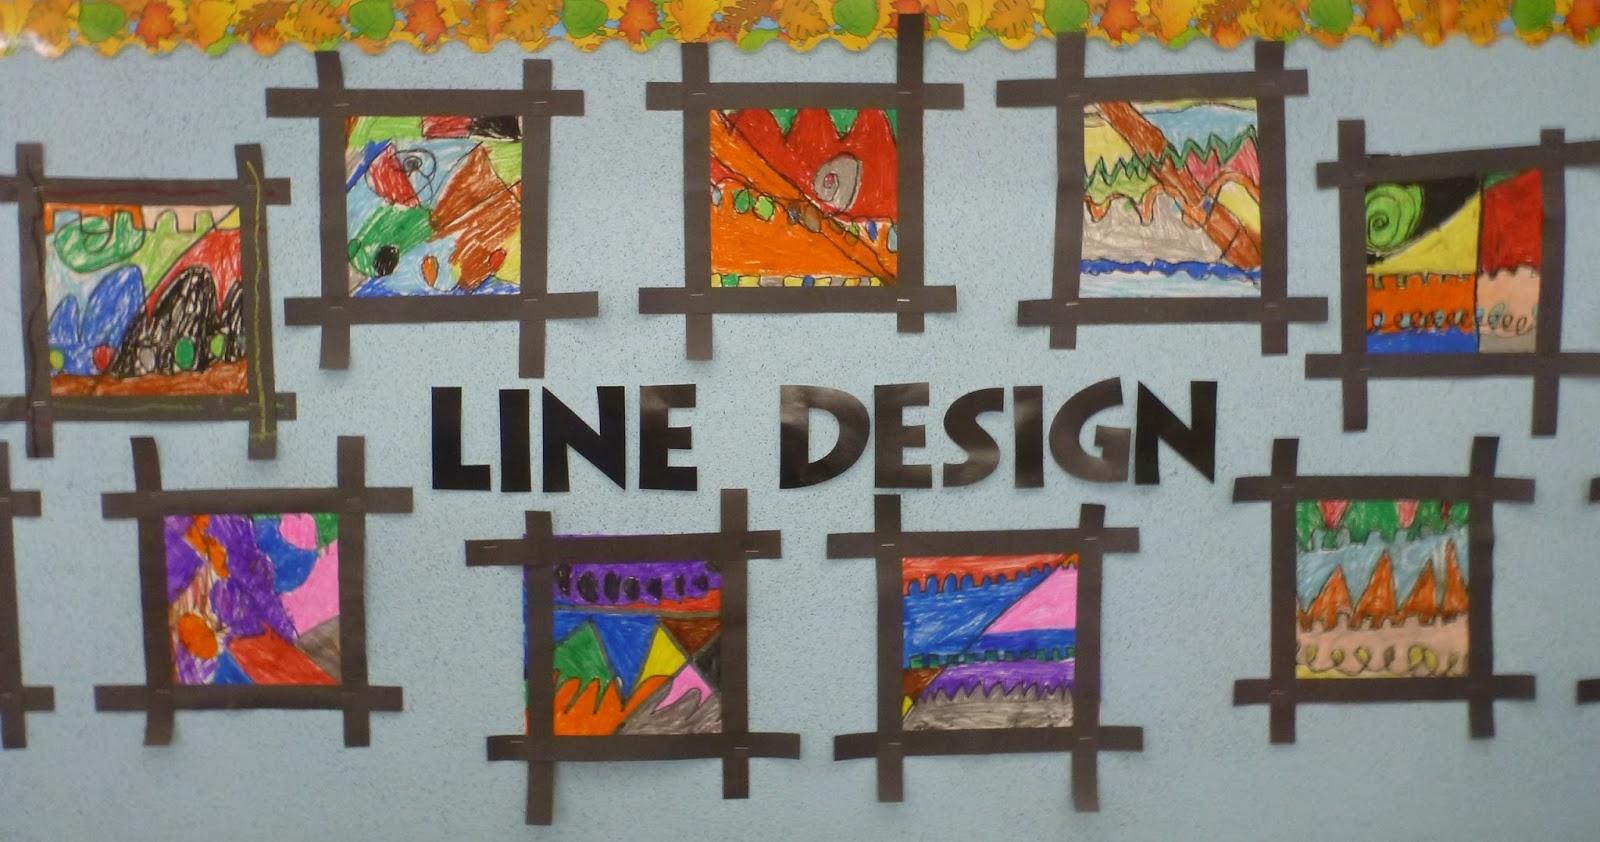 Ms Cocco S Grade 1 Class Our Line Design Art